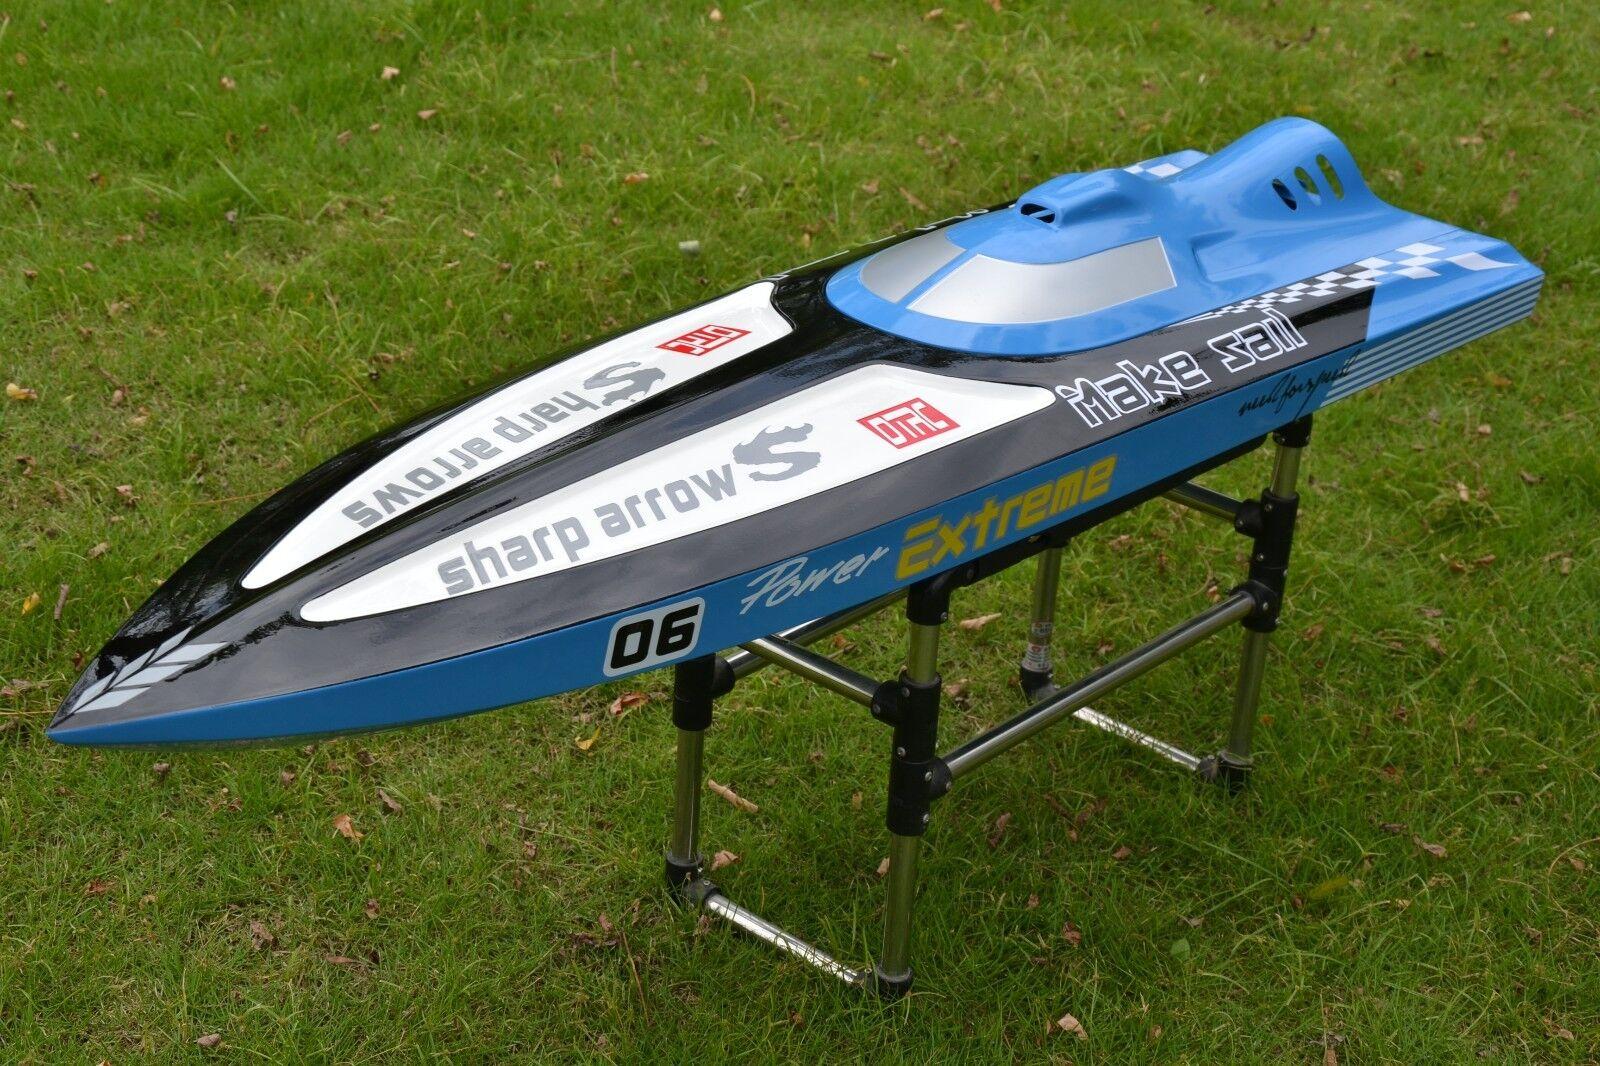 FiberGlass G30C 30CC Engine Gas RC Racing Speed Boat Monohull ARTR Deep bluee